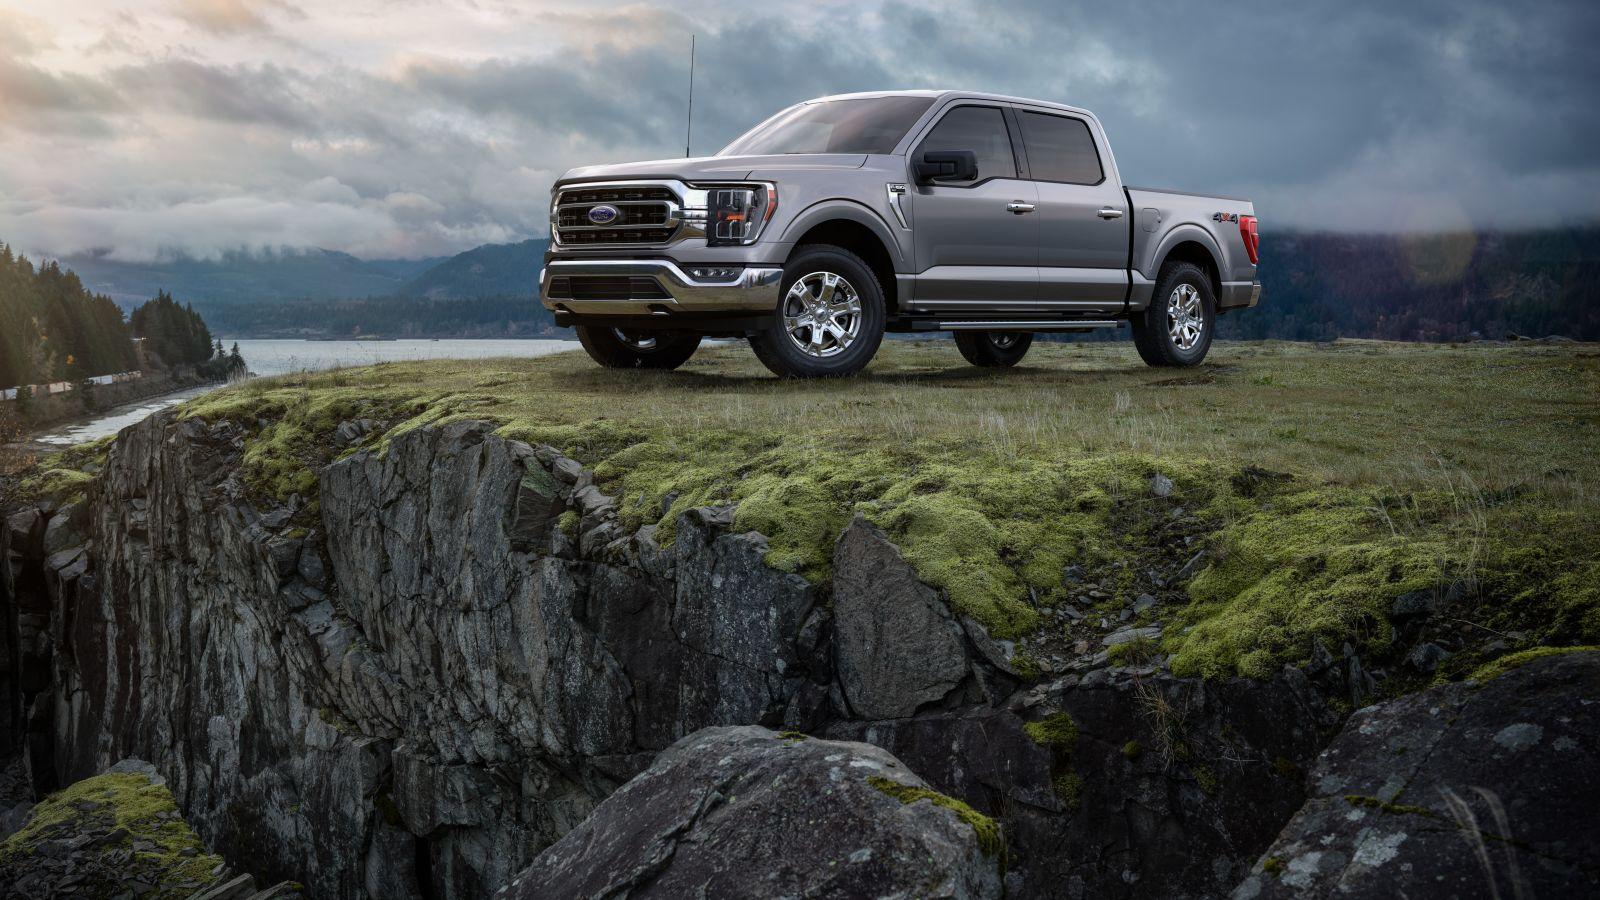 EV復権、「不毛の地」米国で 車産業の「アフタートランプ」